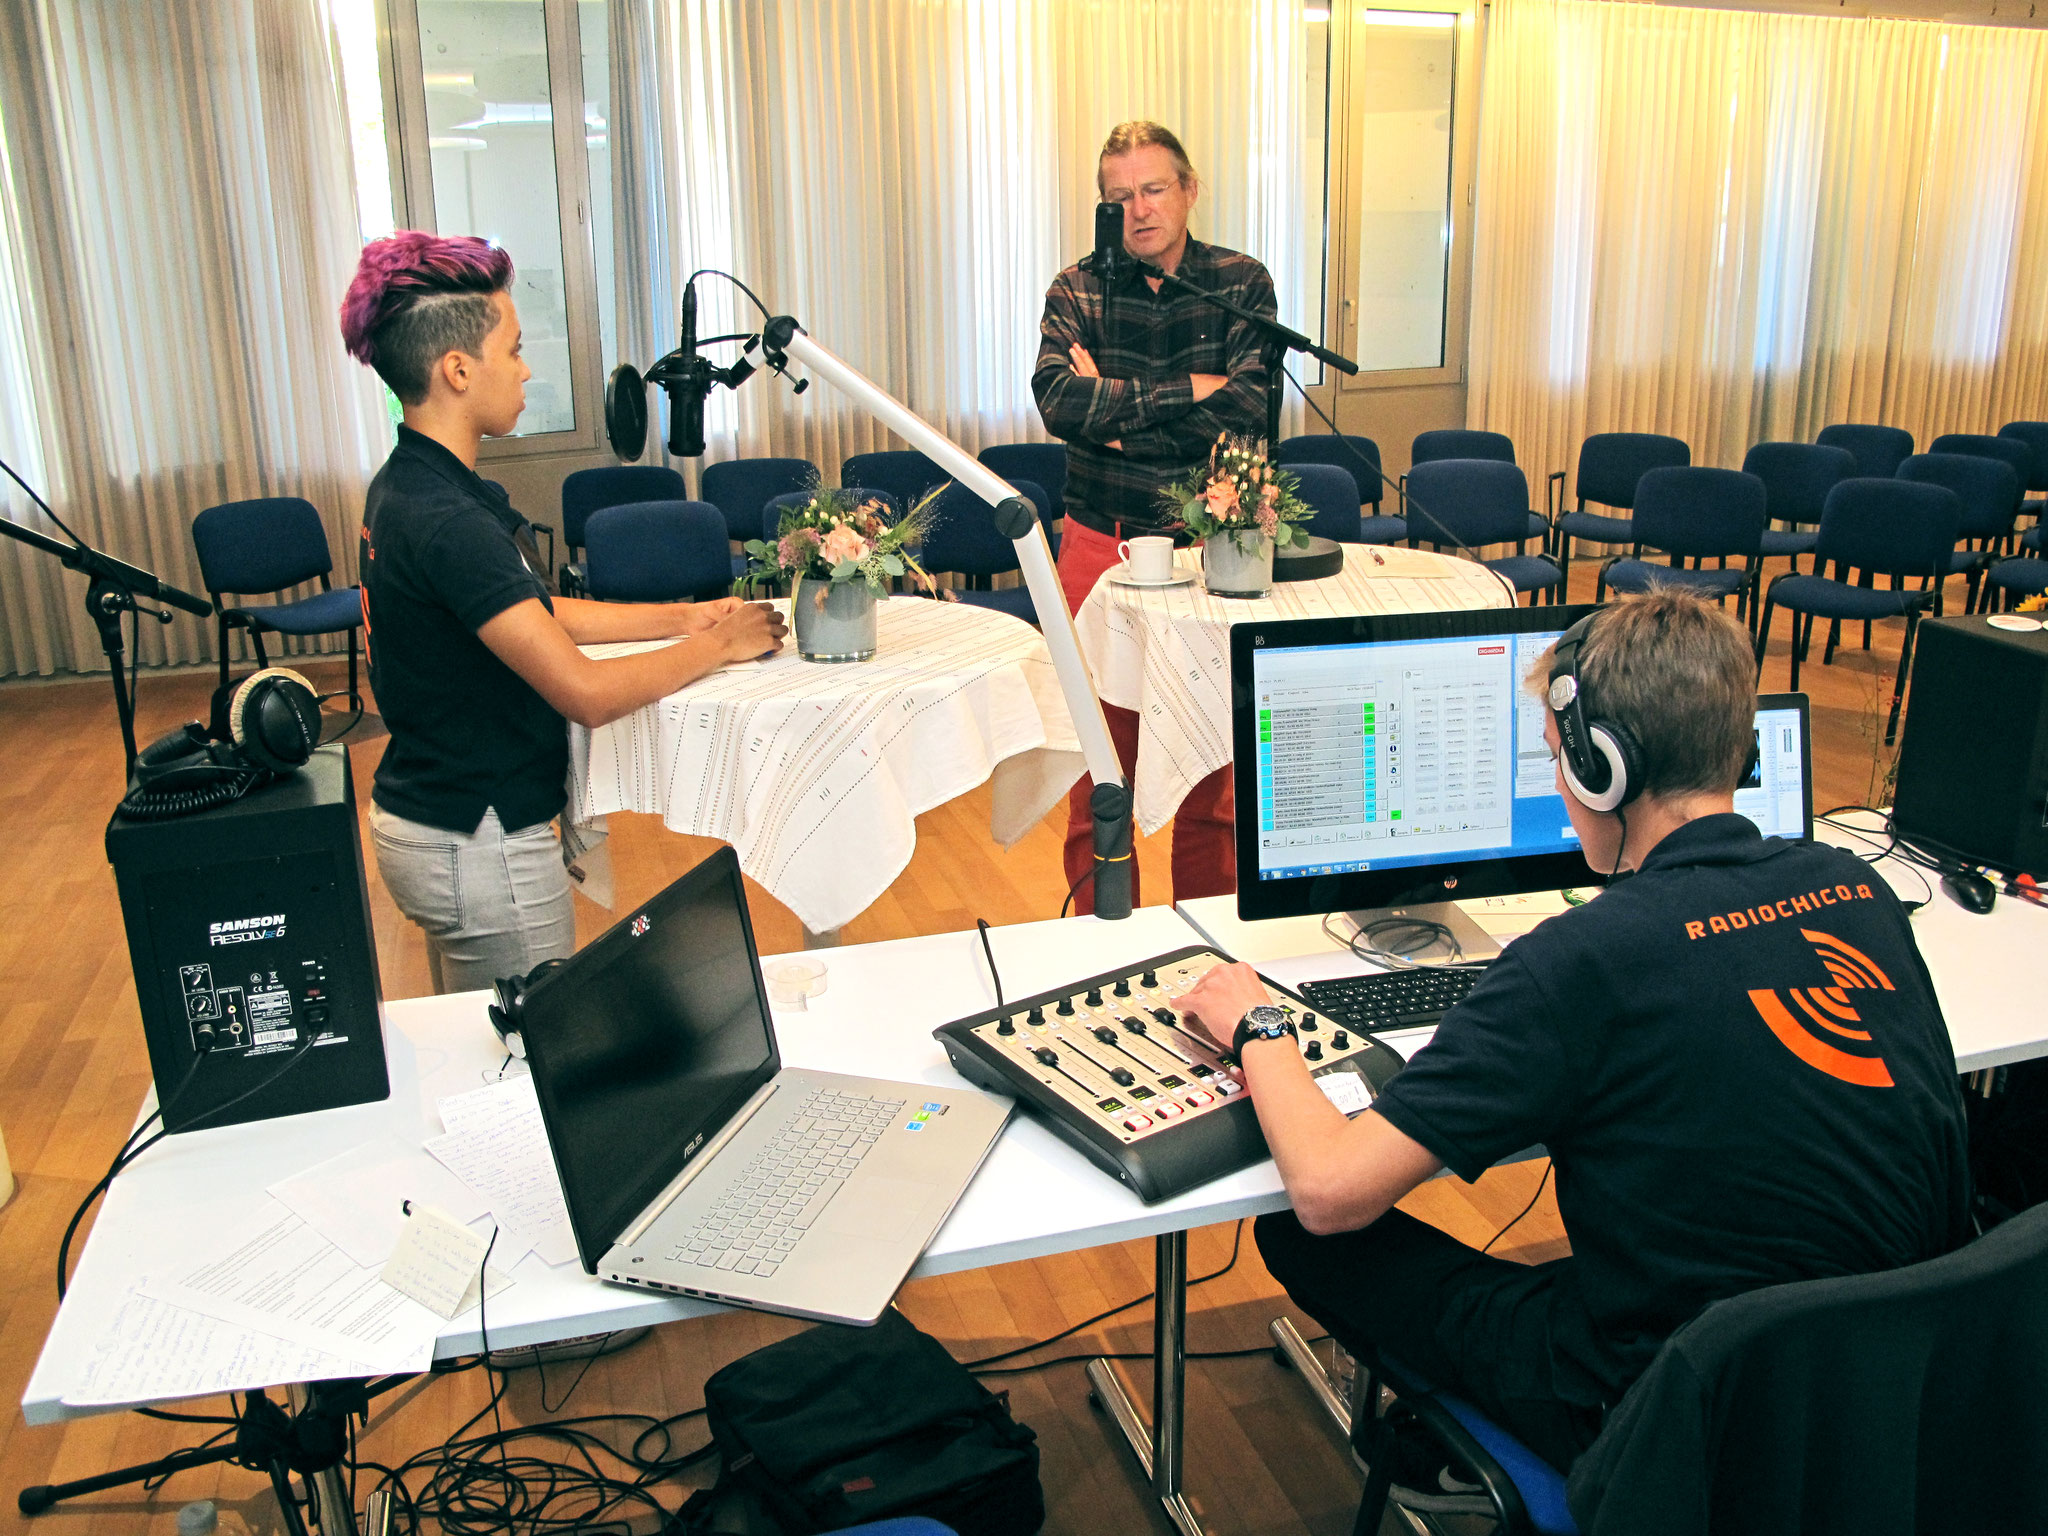 Christoph Pfluger im Gespräch mit Moderatorin Belén